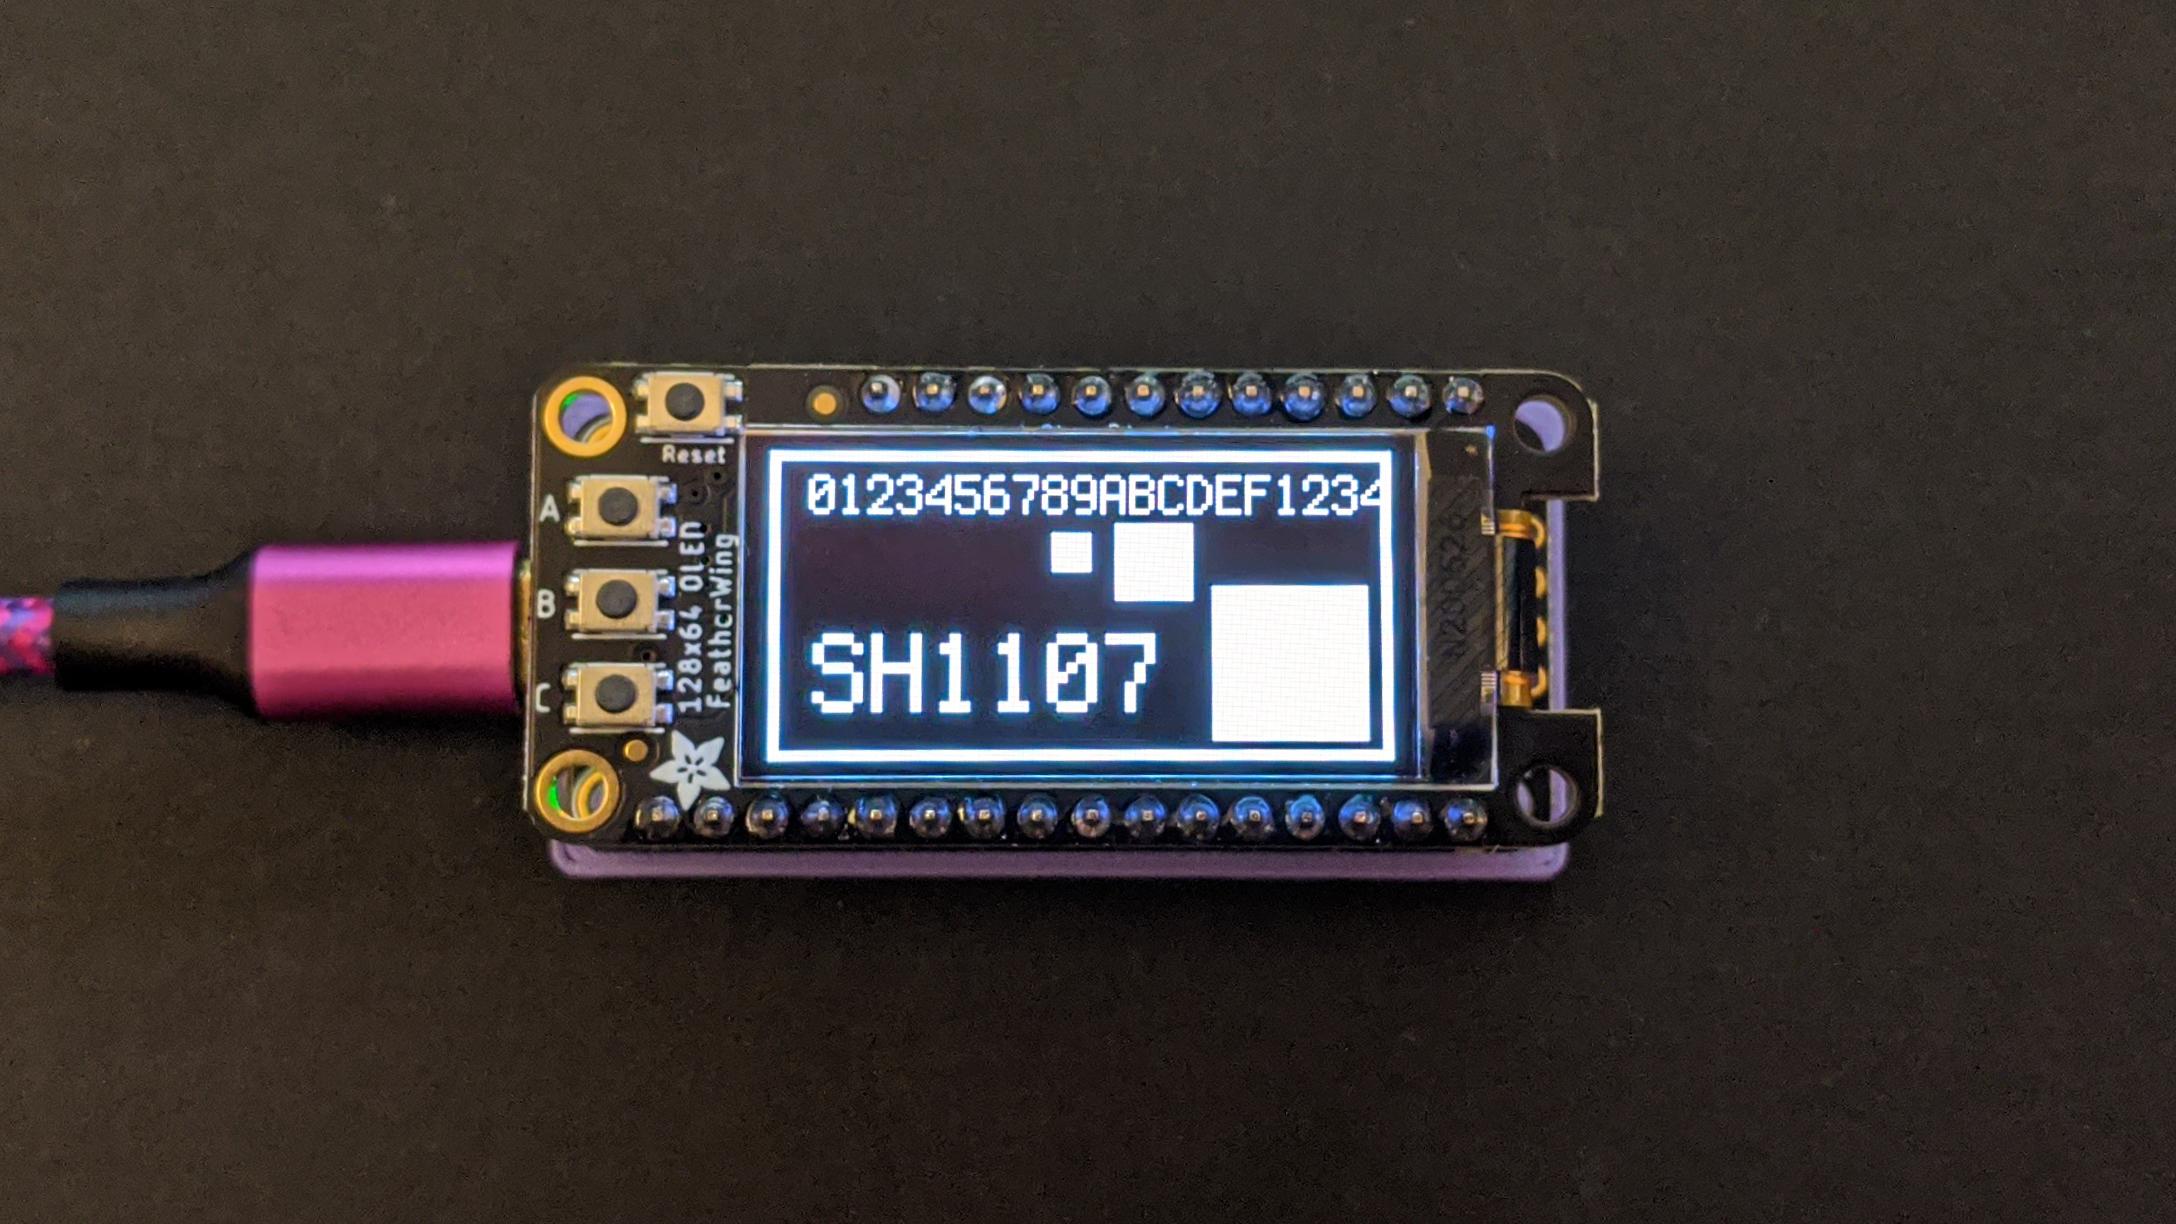 adafruit_products_SH1107_CircuitPython_simpletest.jpg